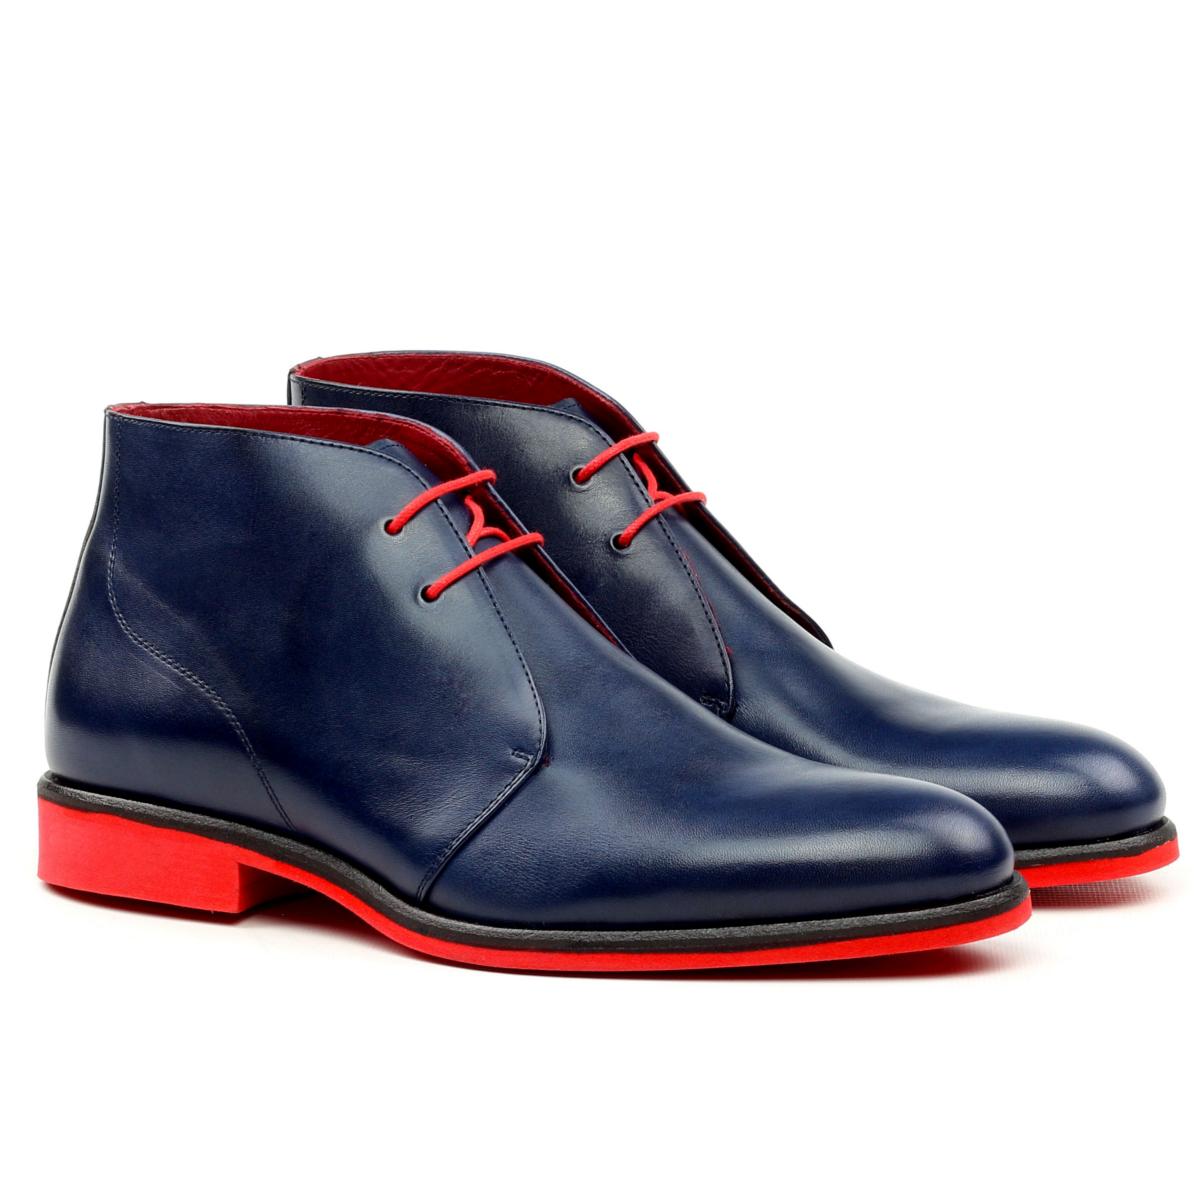 Blue box calf Chukka boot